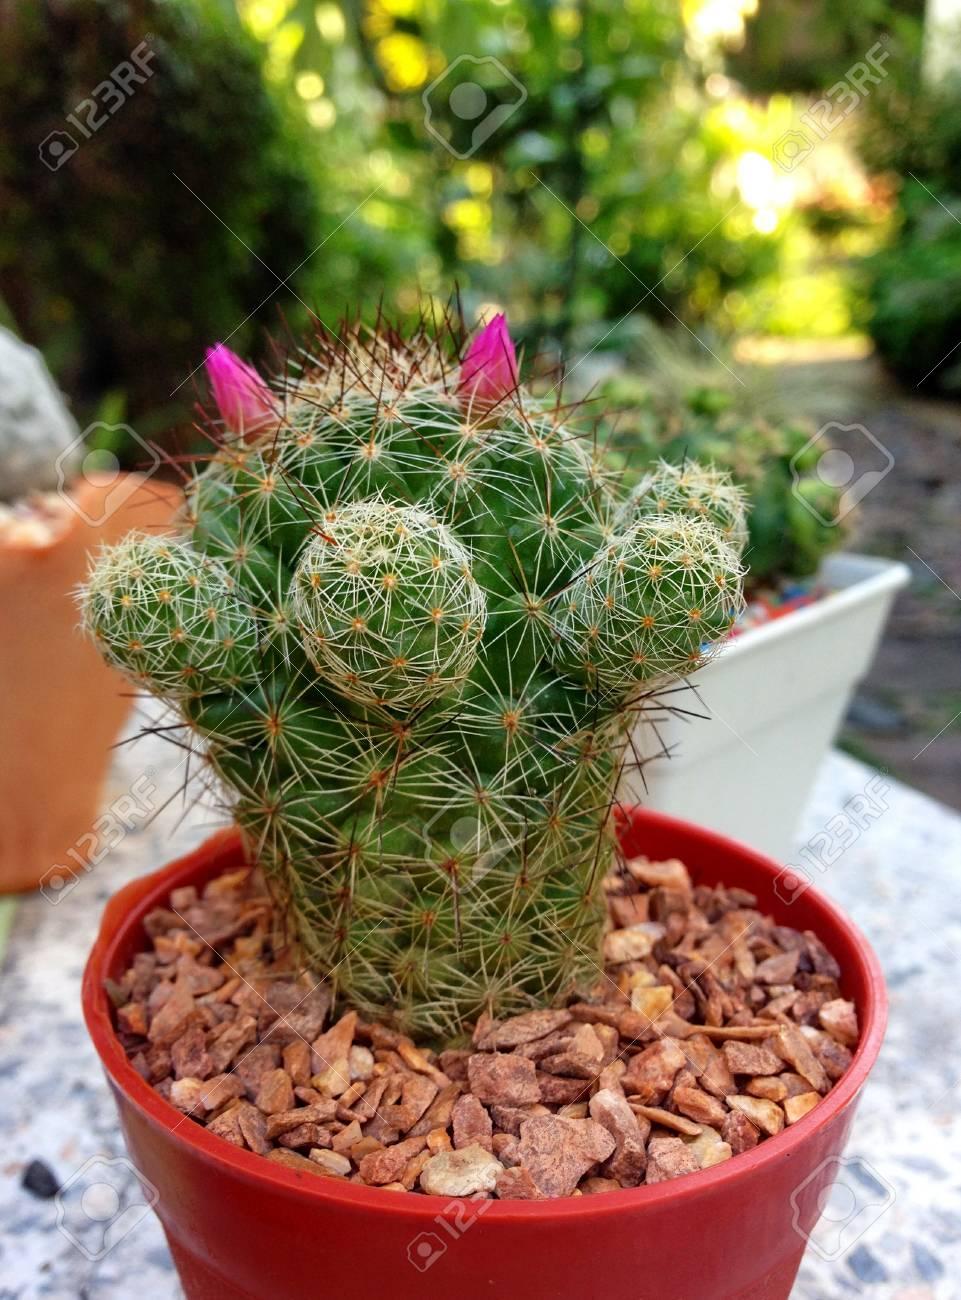 Cactus with small pink flowers stock photo picture and royalty free cactus with small pink flowers stock photo 68246187 mightylinksfo